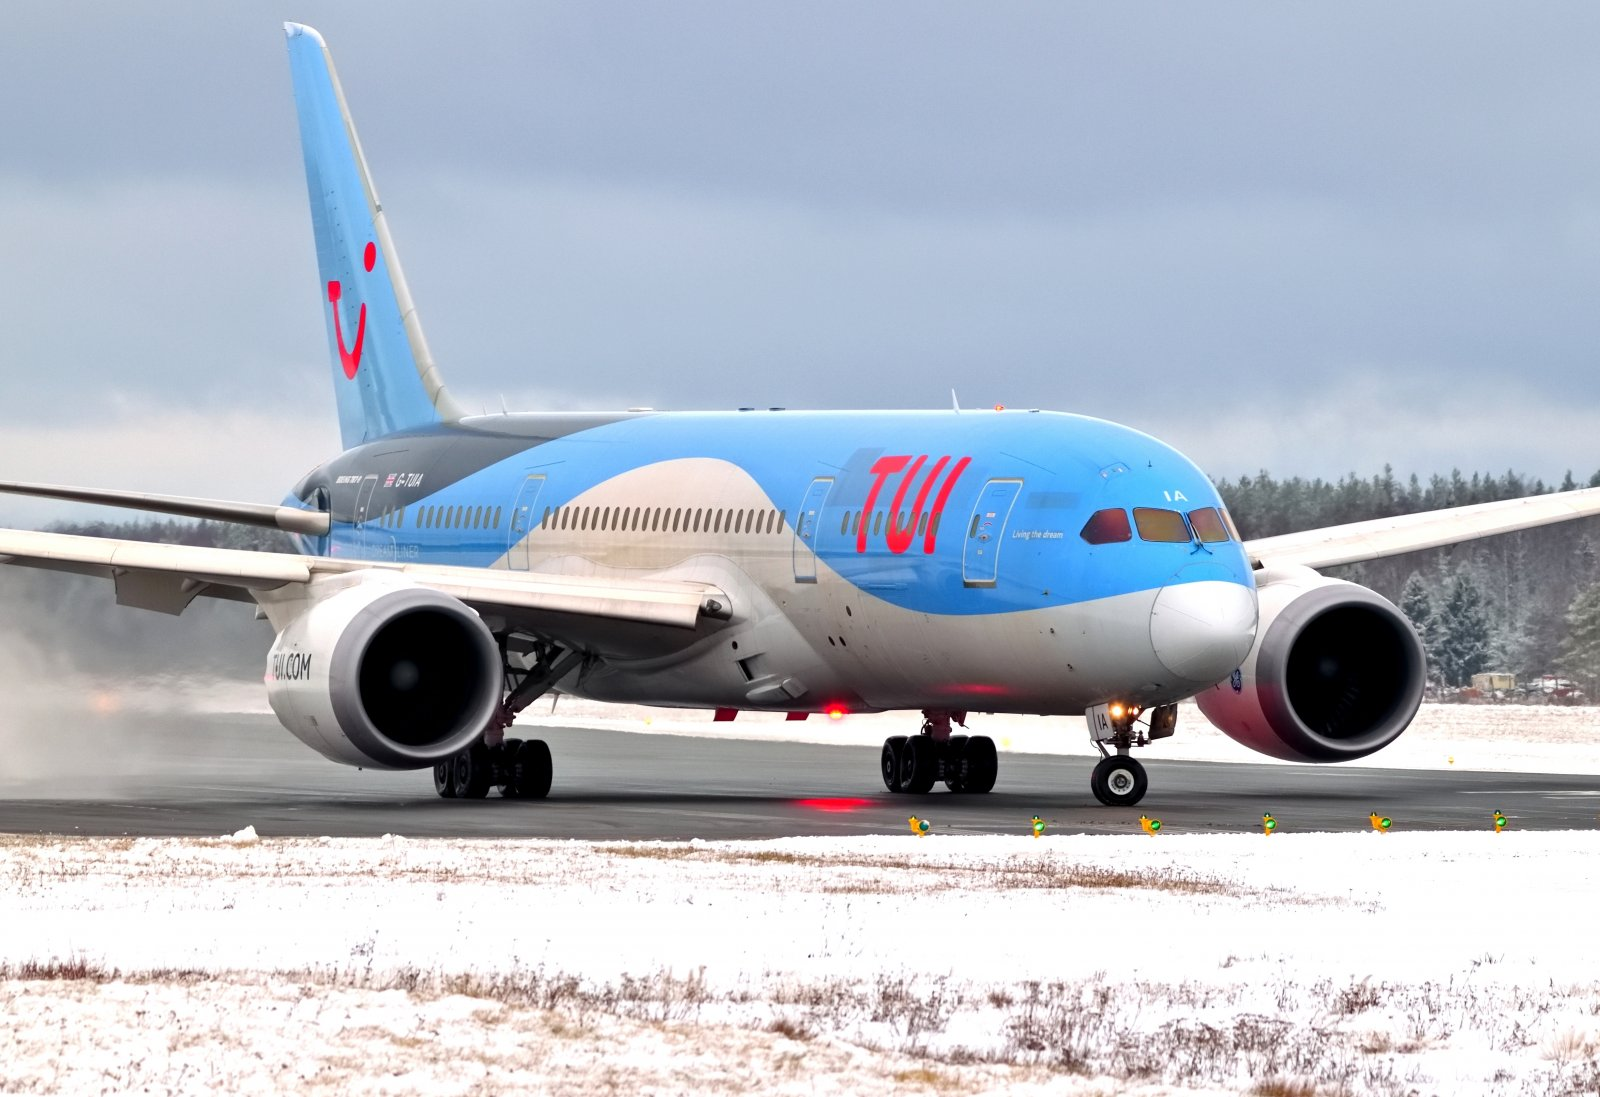 G-TUIA - Boeing 787-8 Dreamliner - TUI - 26.1.2020